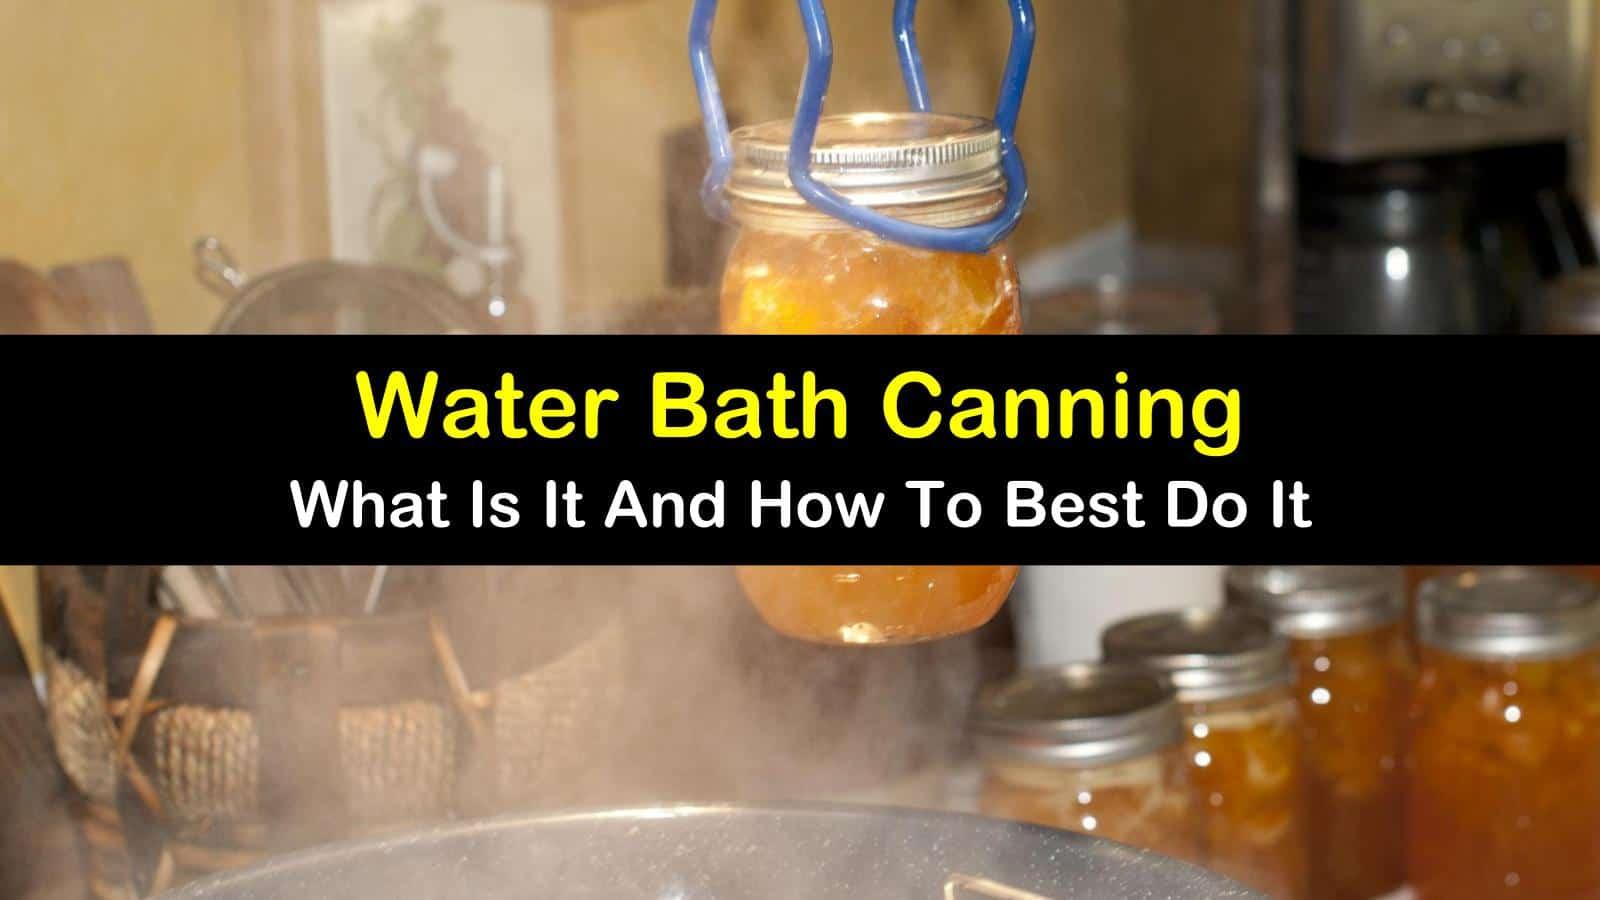 water bath canning titleimg1